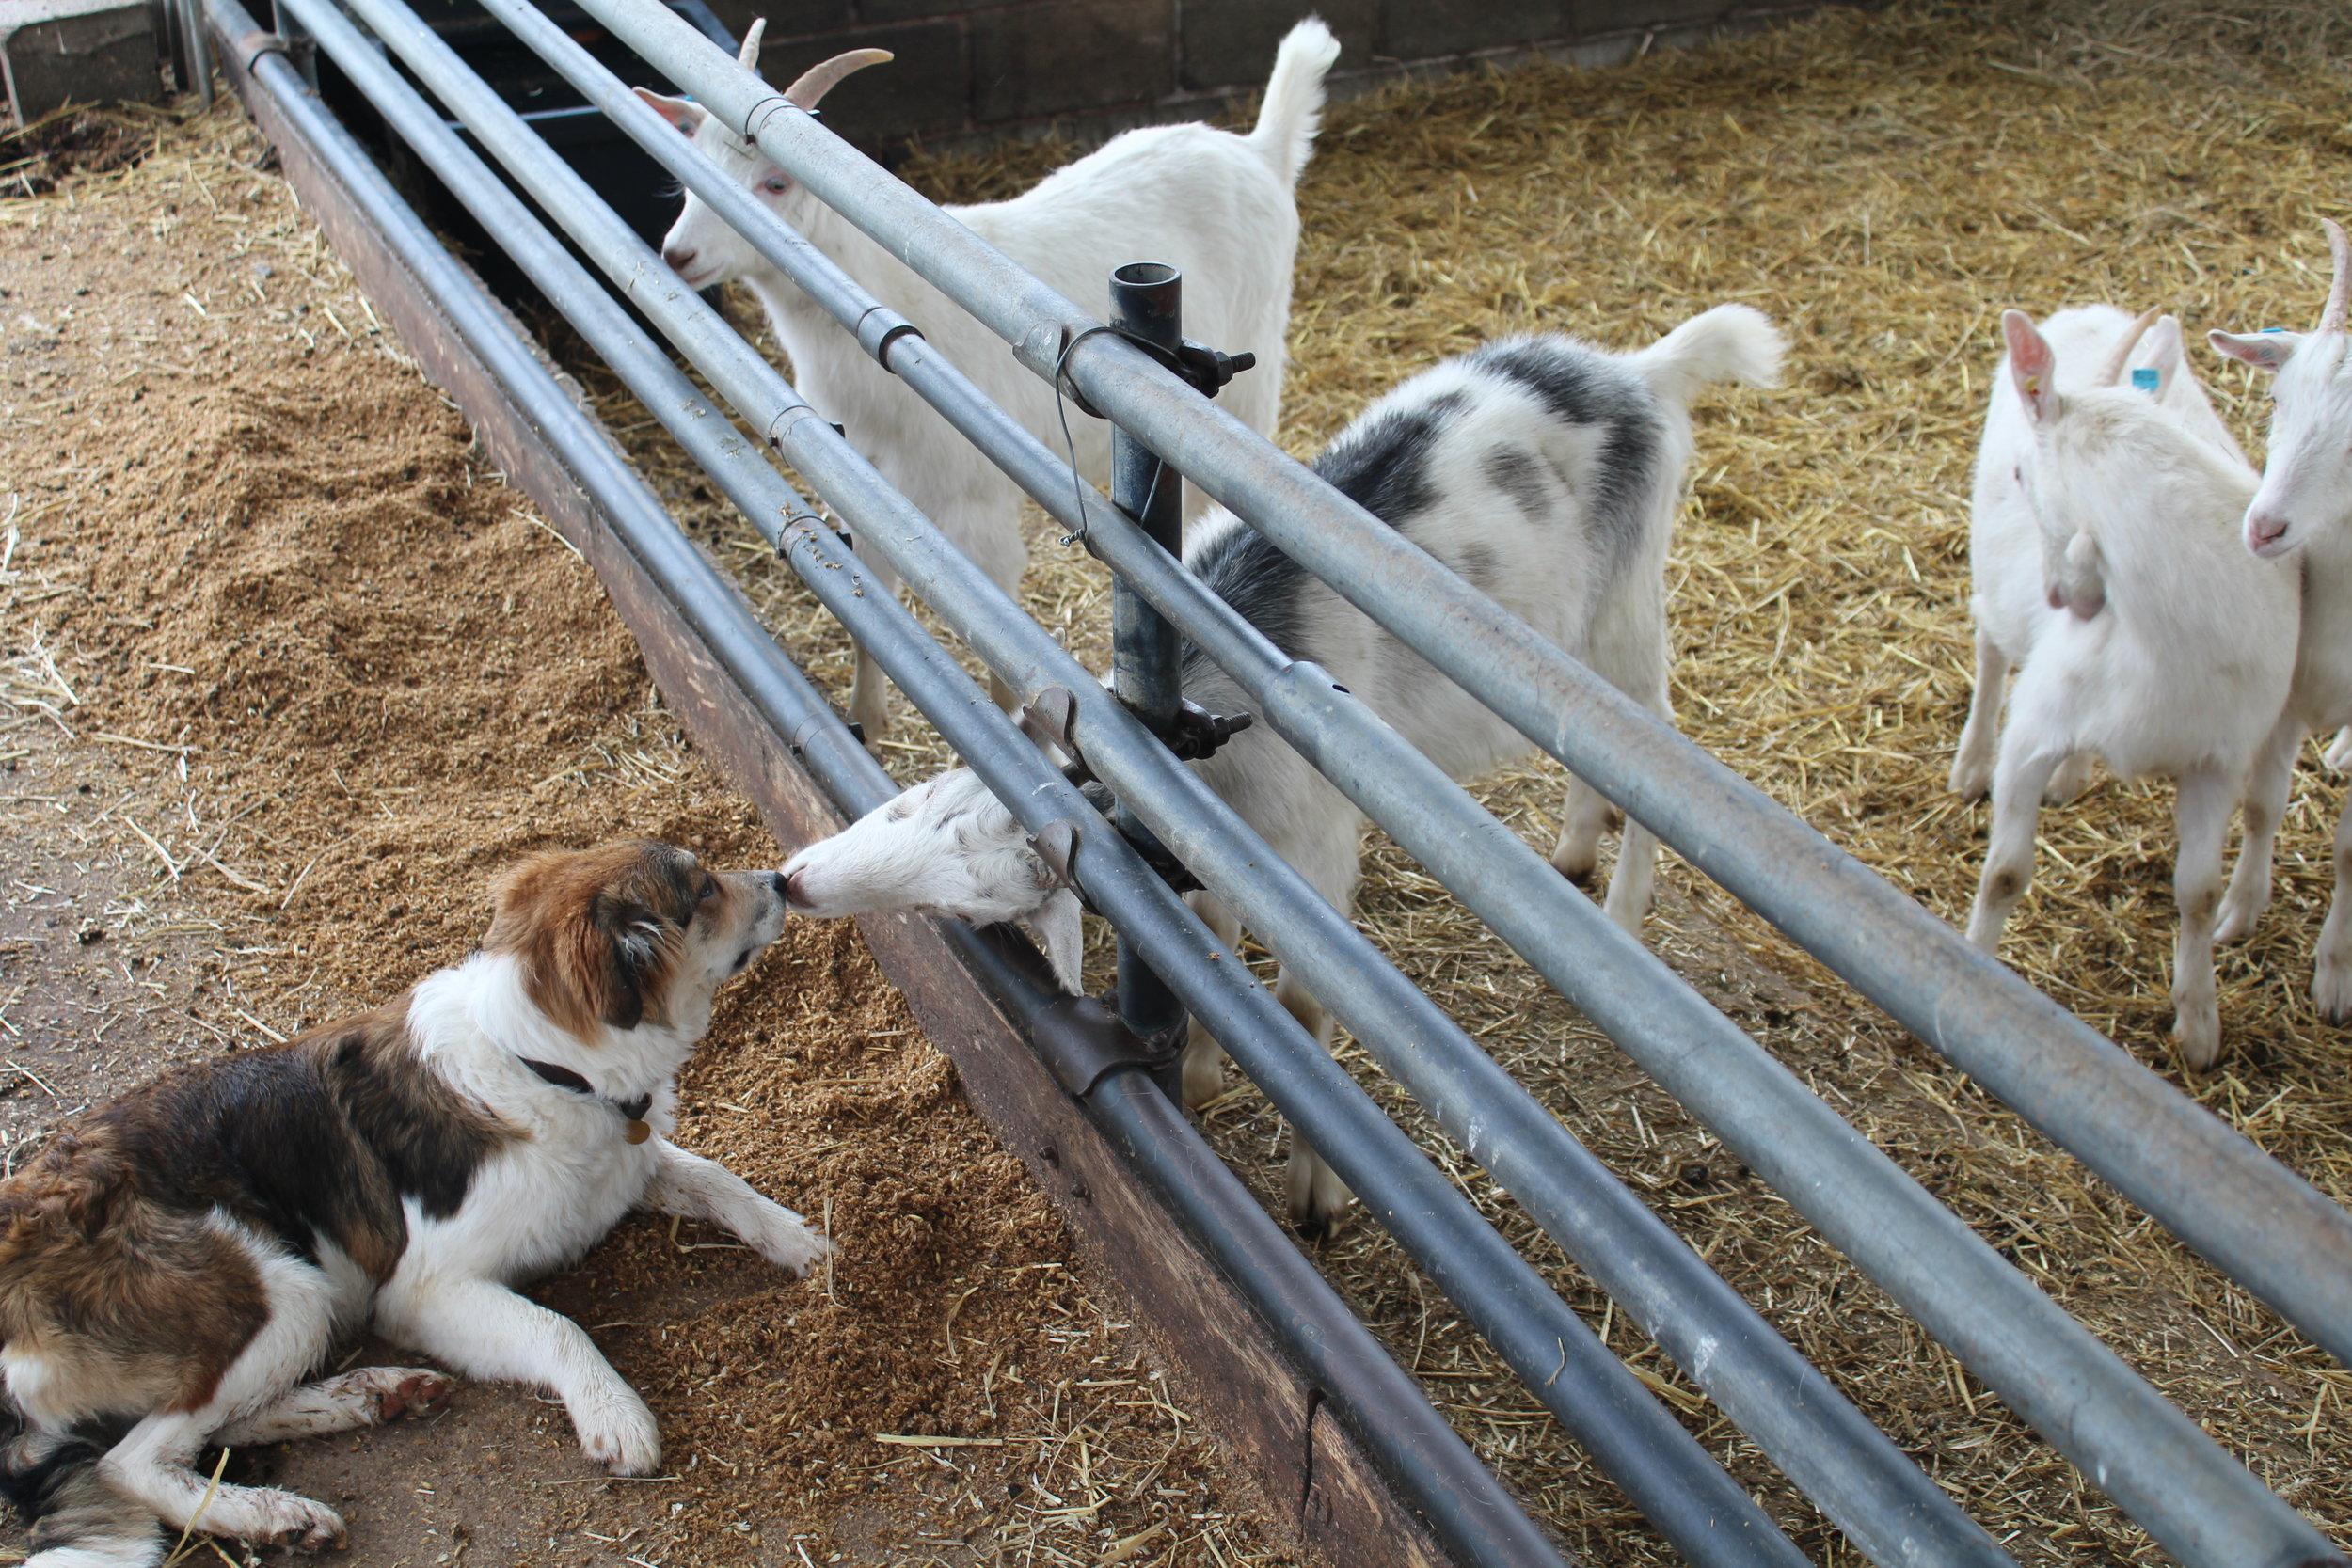 Herding dog in 'training'